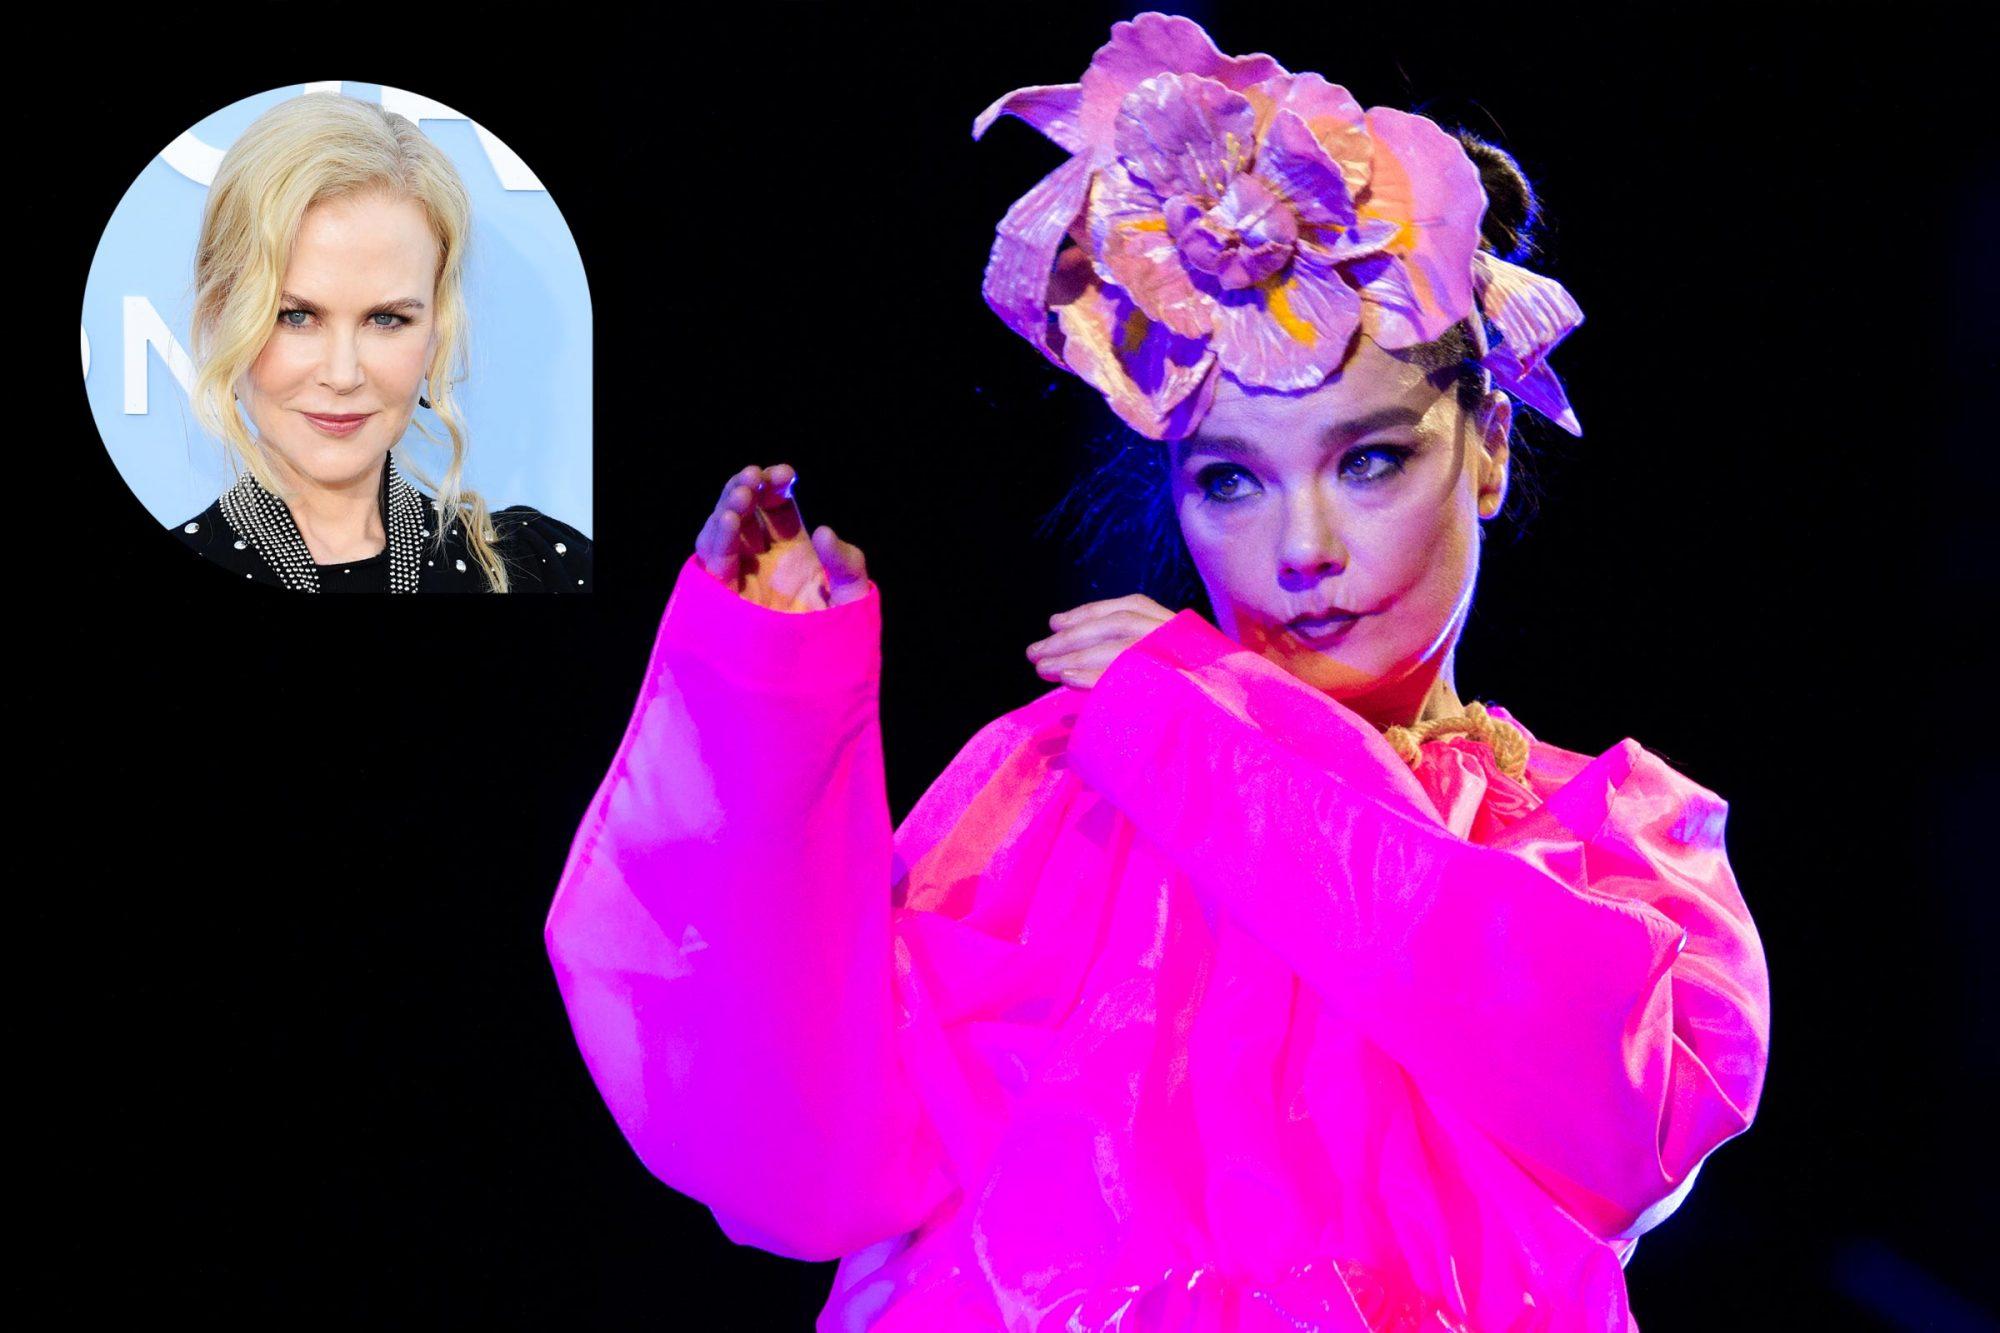 Bjorl; Nicole Kidman